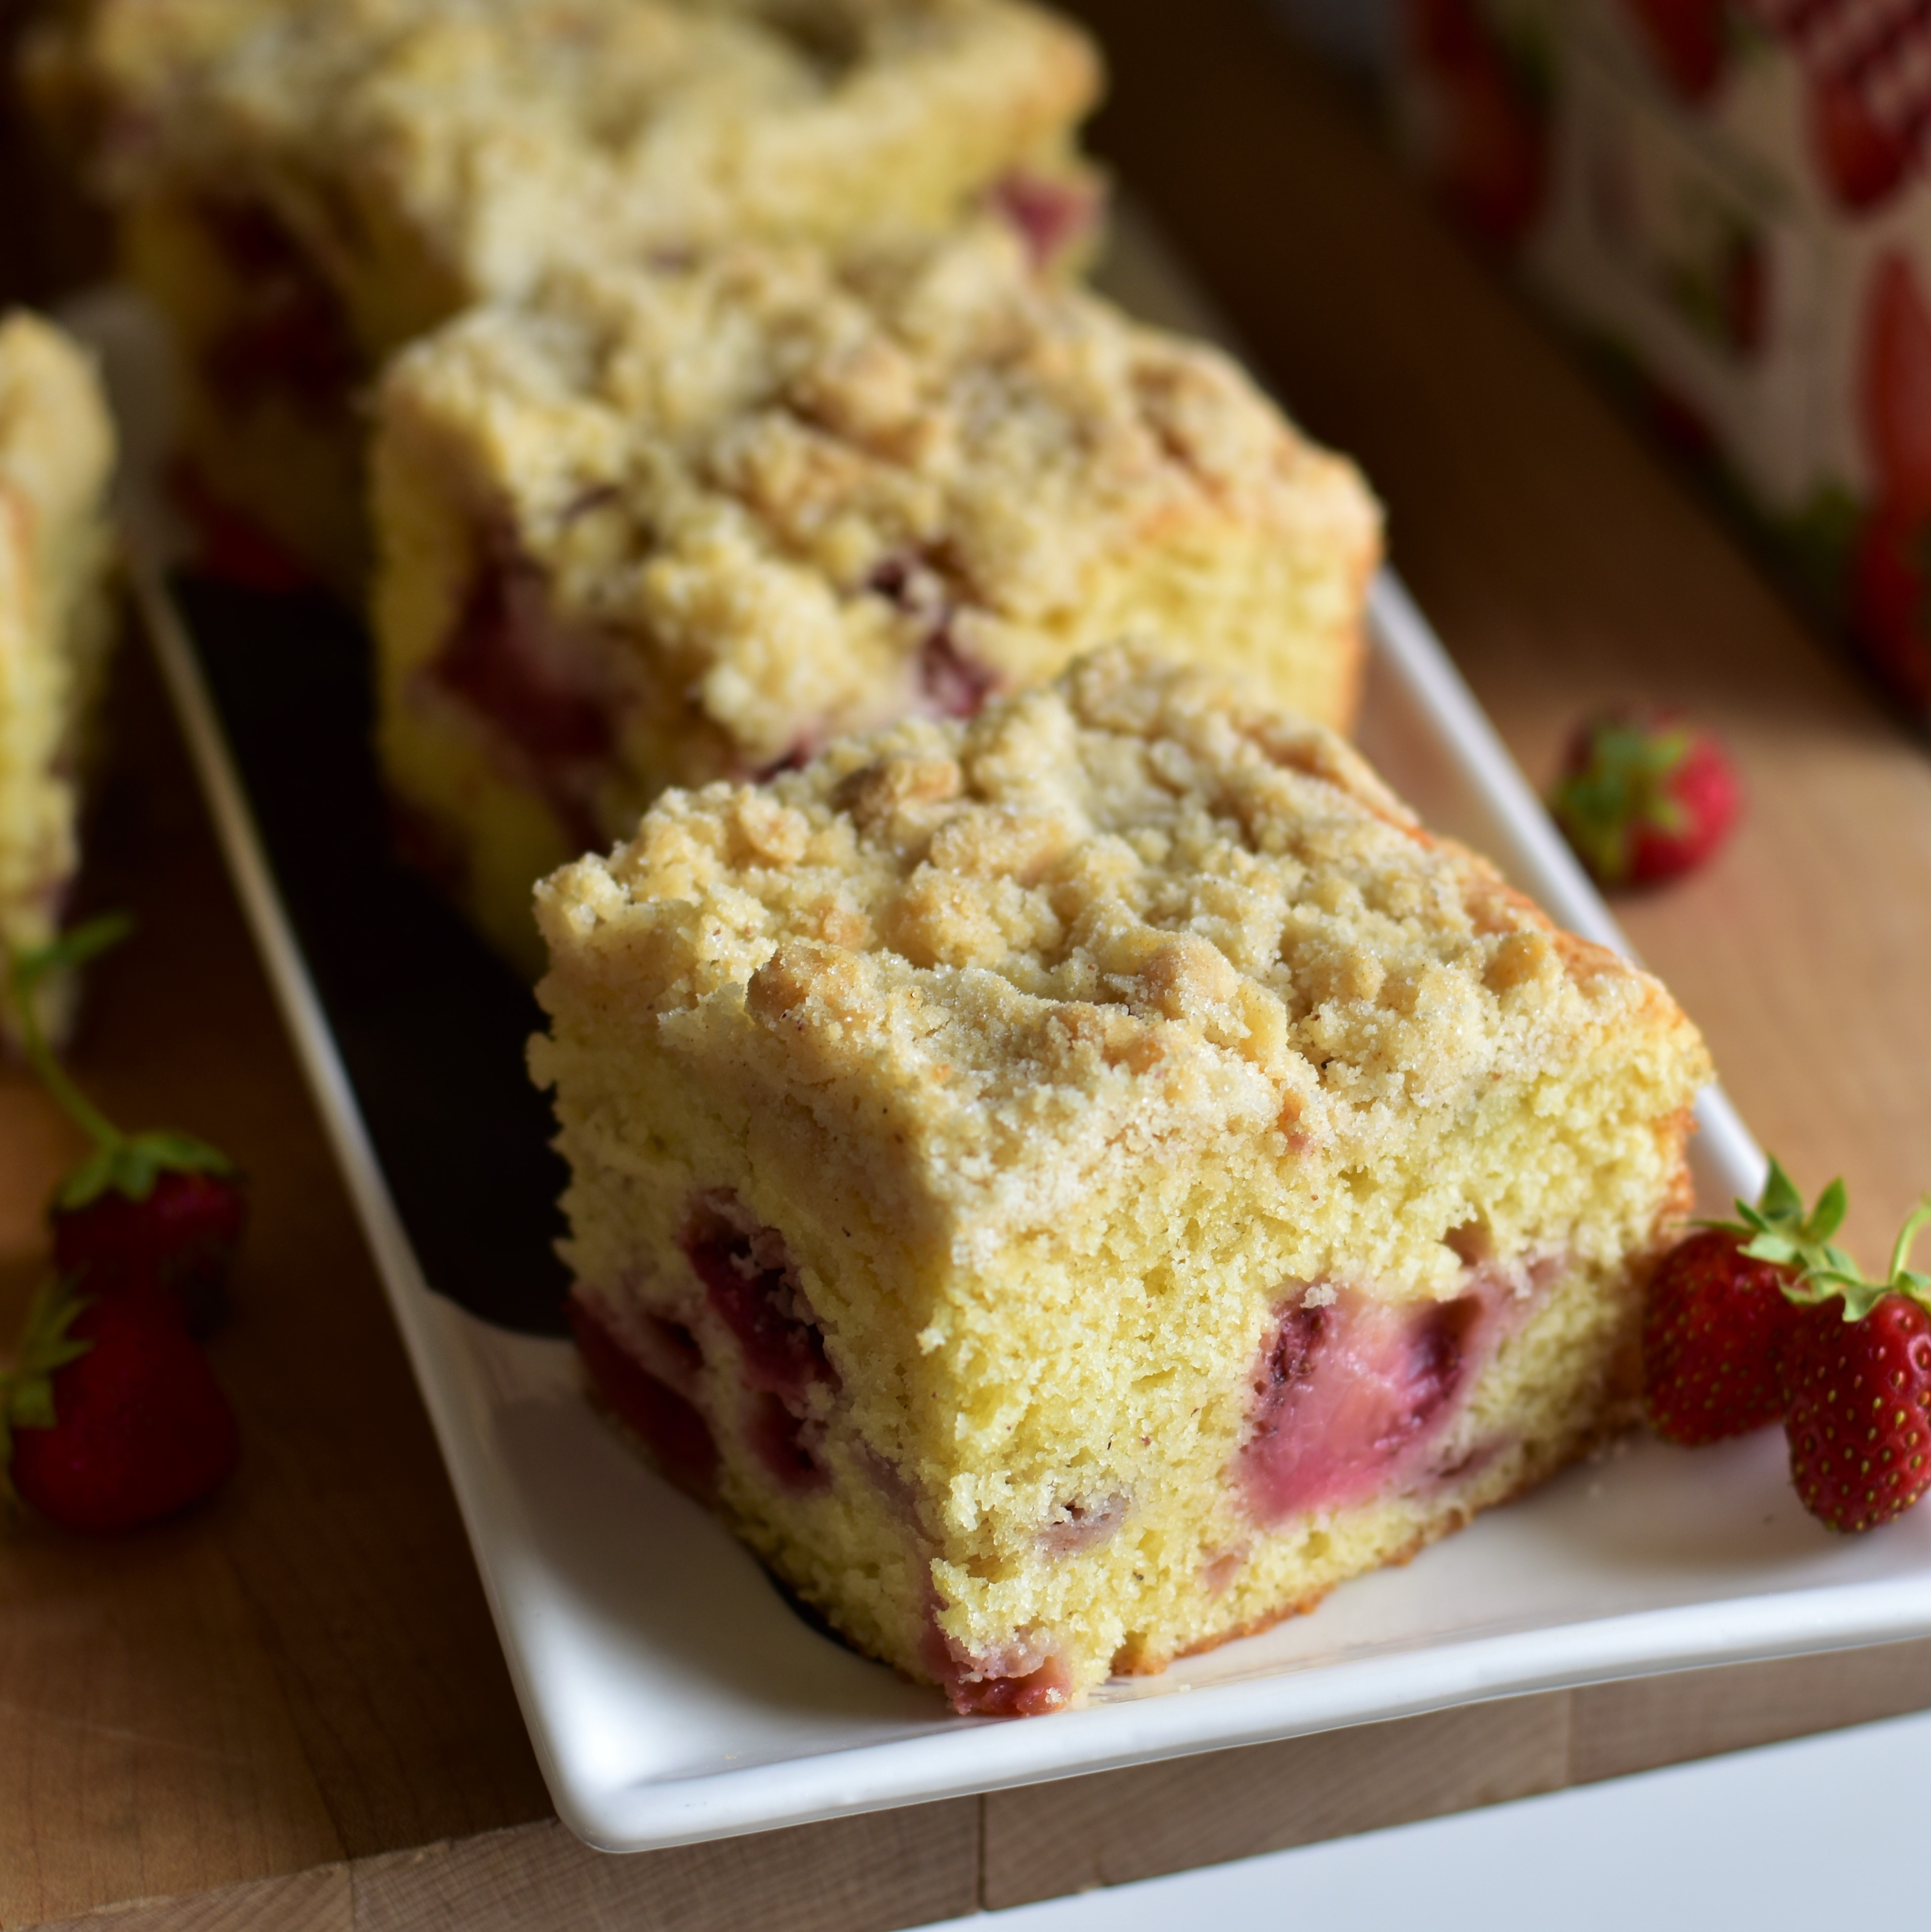 Strawberry Buttermilk Crumb Cake